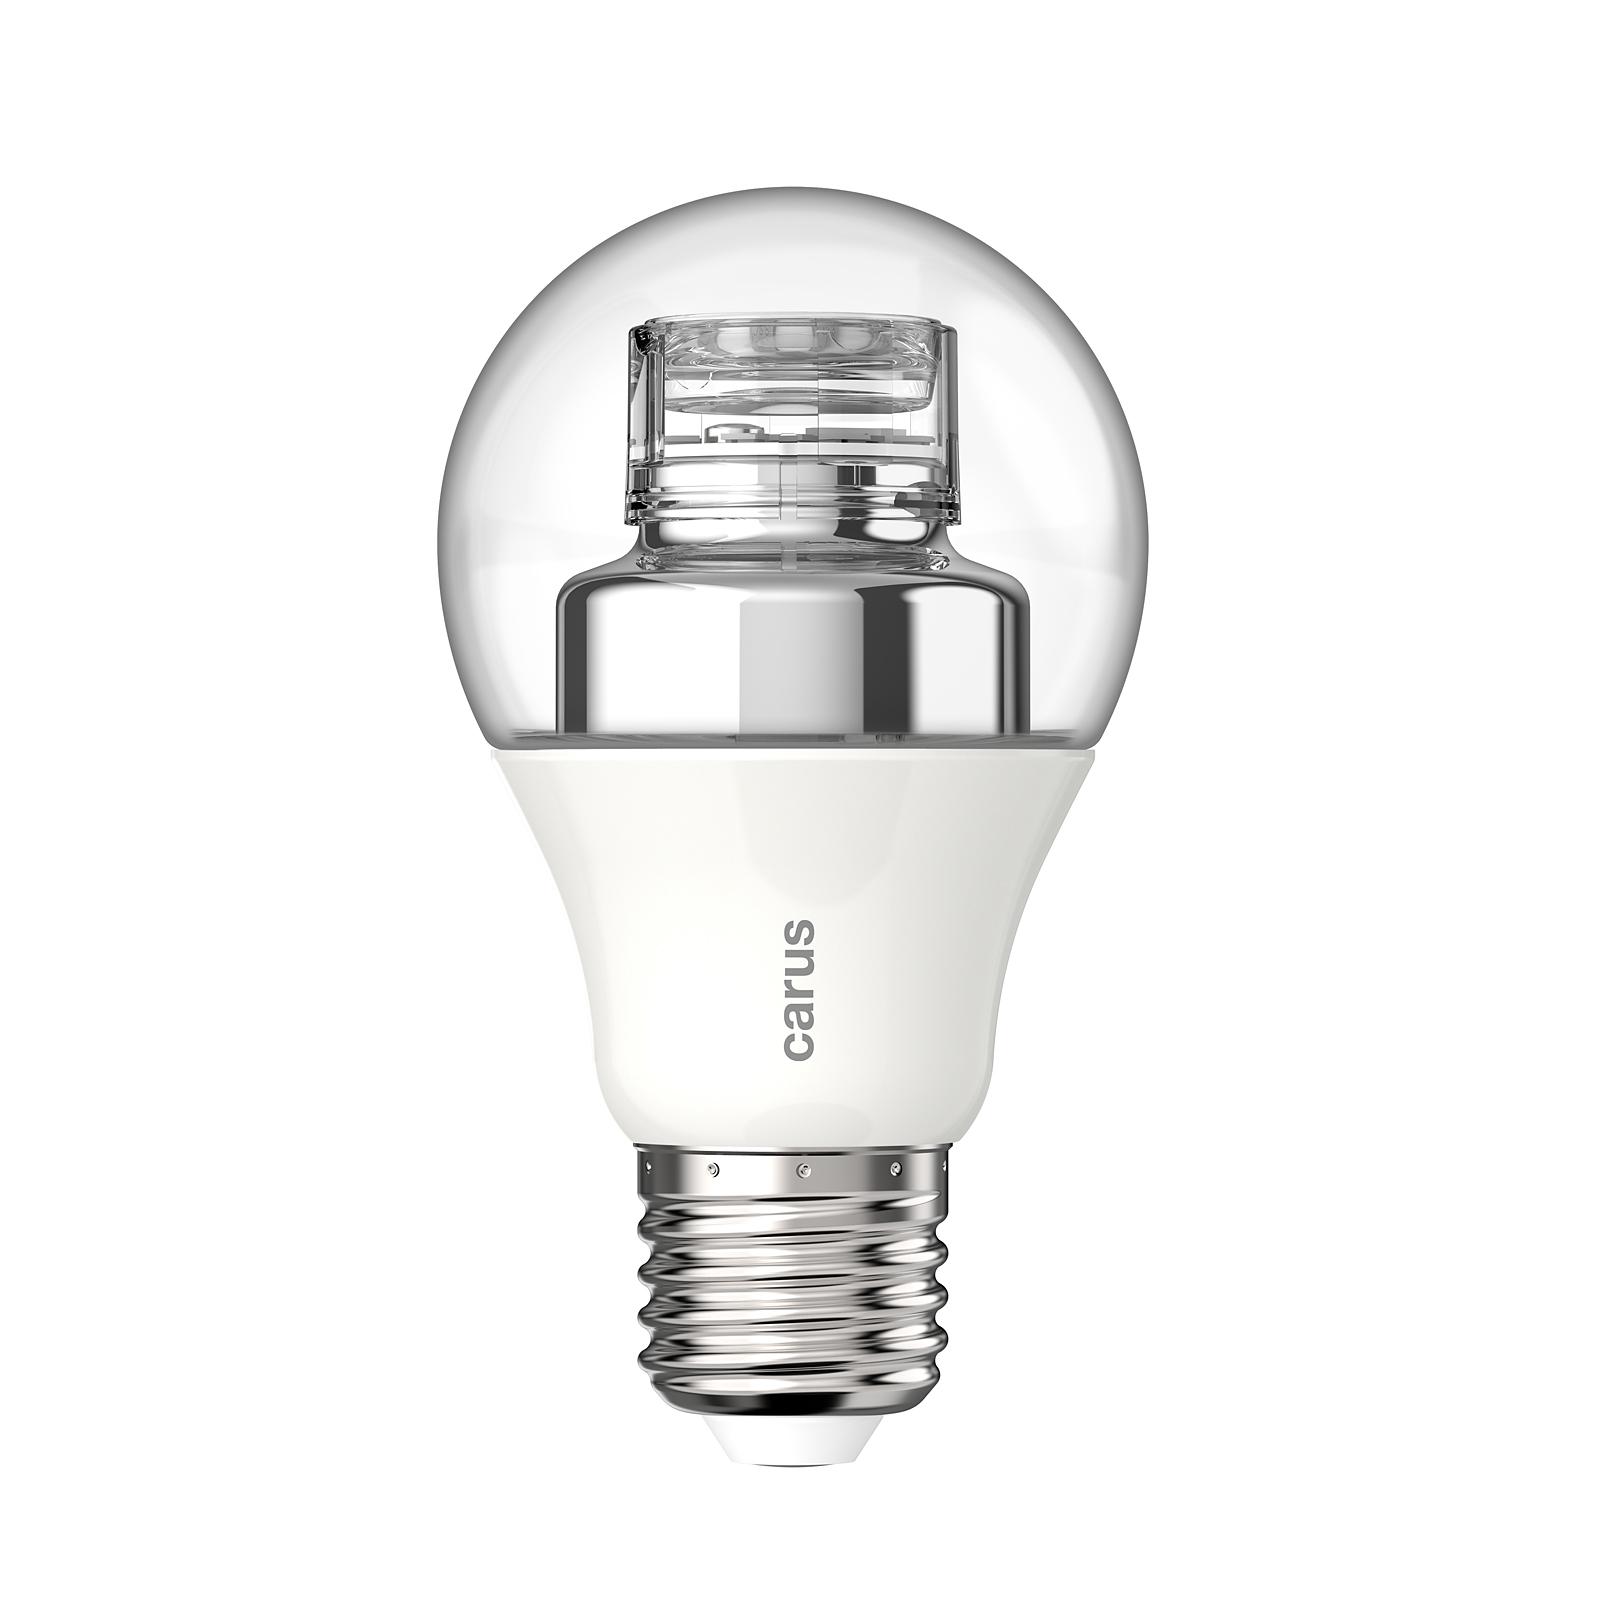 10881-CARUS-Warm-By-Click-Lampe-E27-75W-470lm-wie-48-Watt-dimmbar-per-Lichtschalter-1 Spannende Welche Lampen Sind Dimmbar Dekorationen